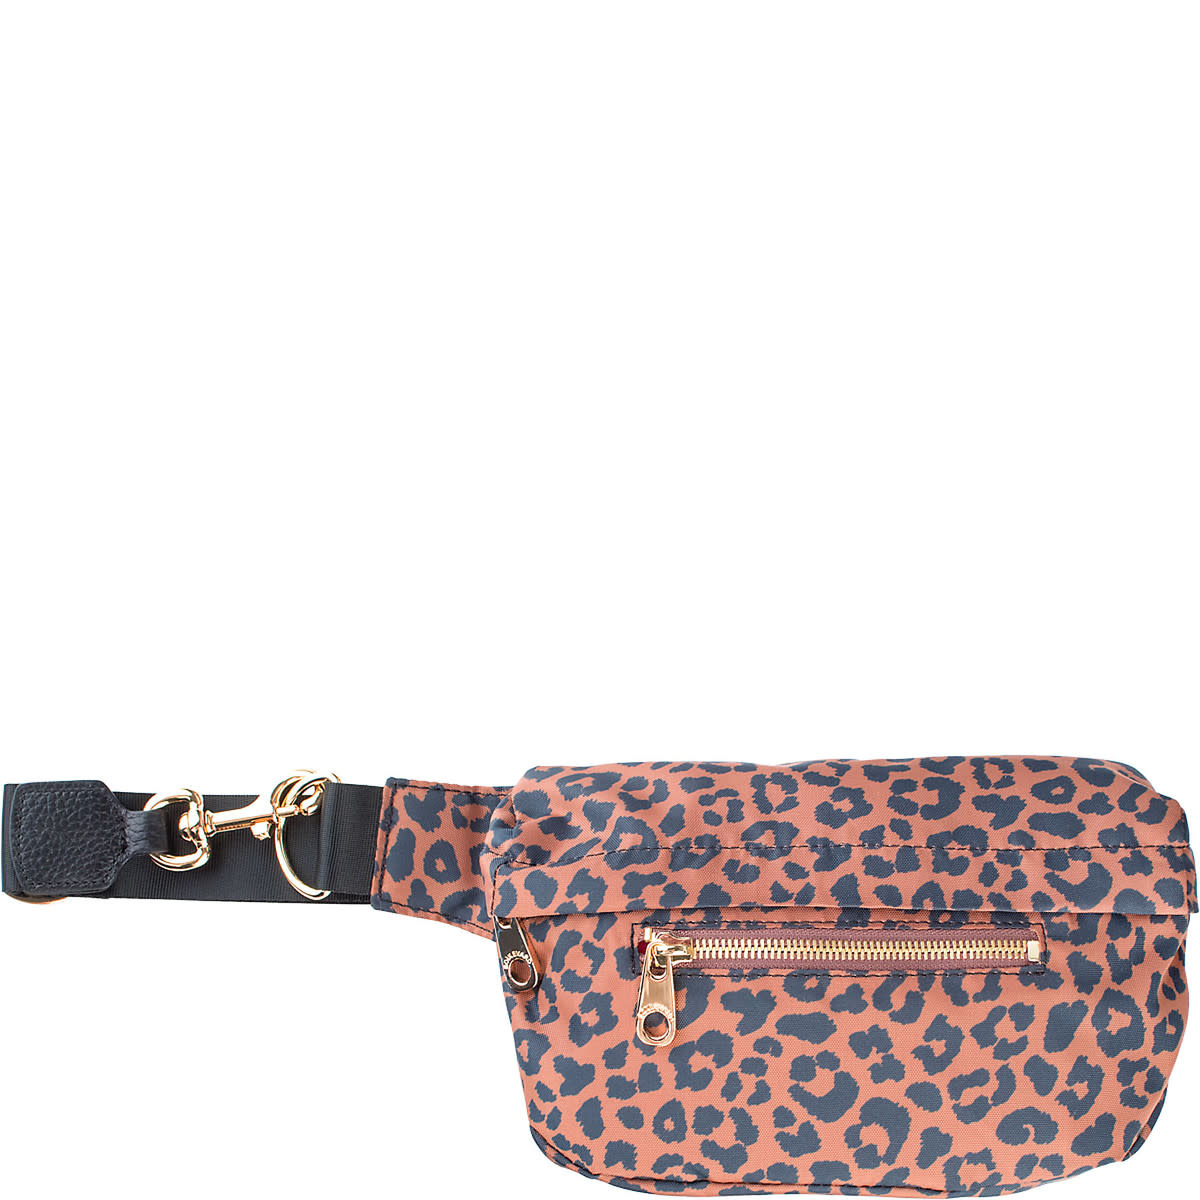 Boulevard Franny Fanny Pack Leopard Large